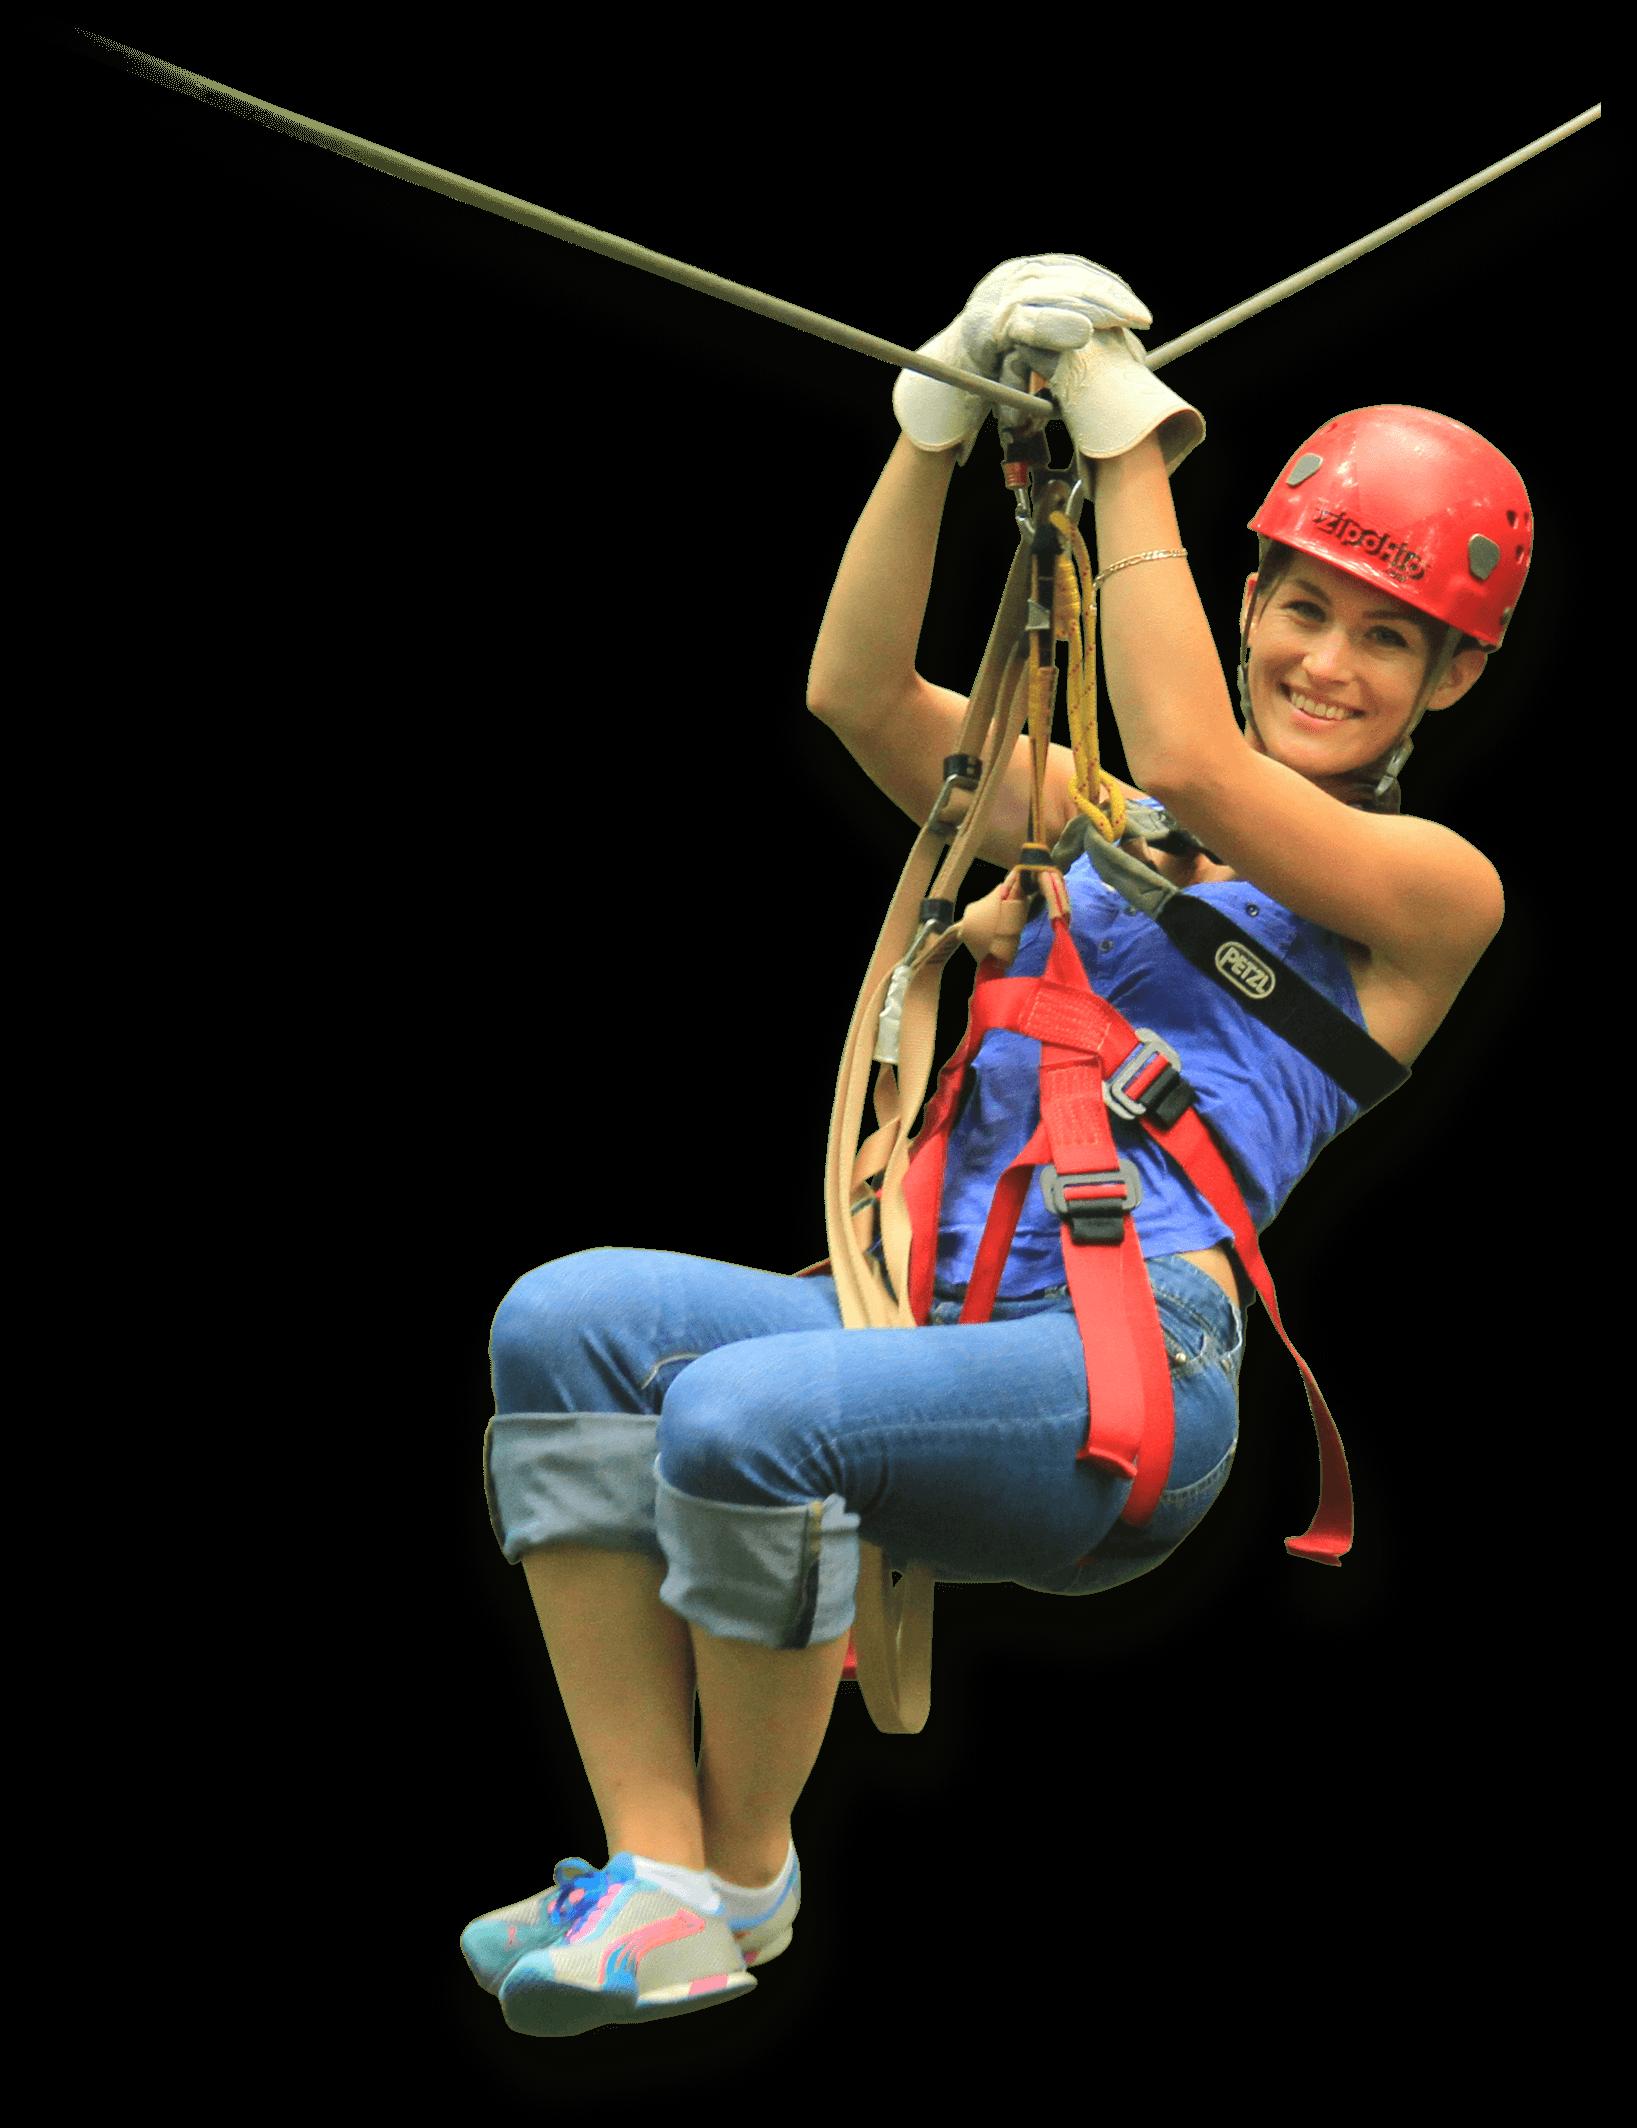 Hocking Hills Canopy Tours World Class Zipline Zipline Adventure Ziplining Adventure